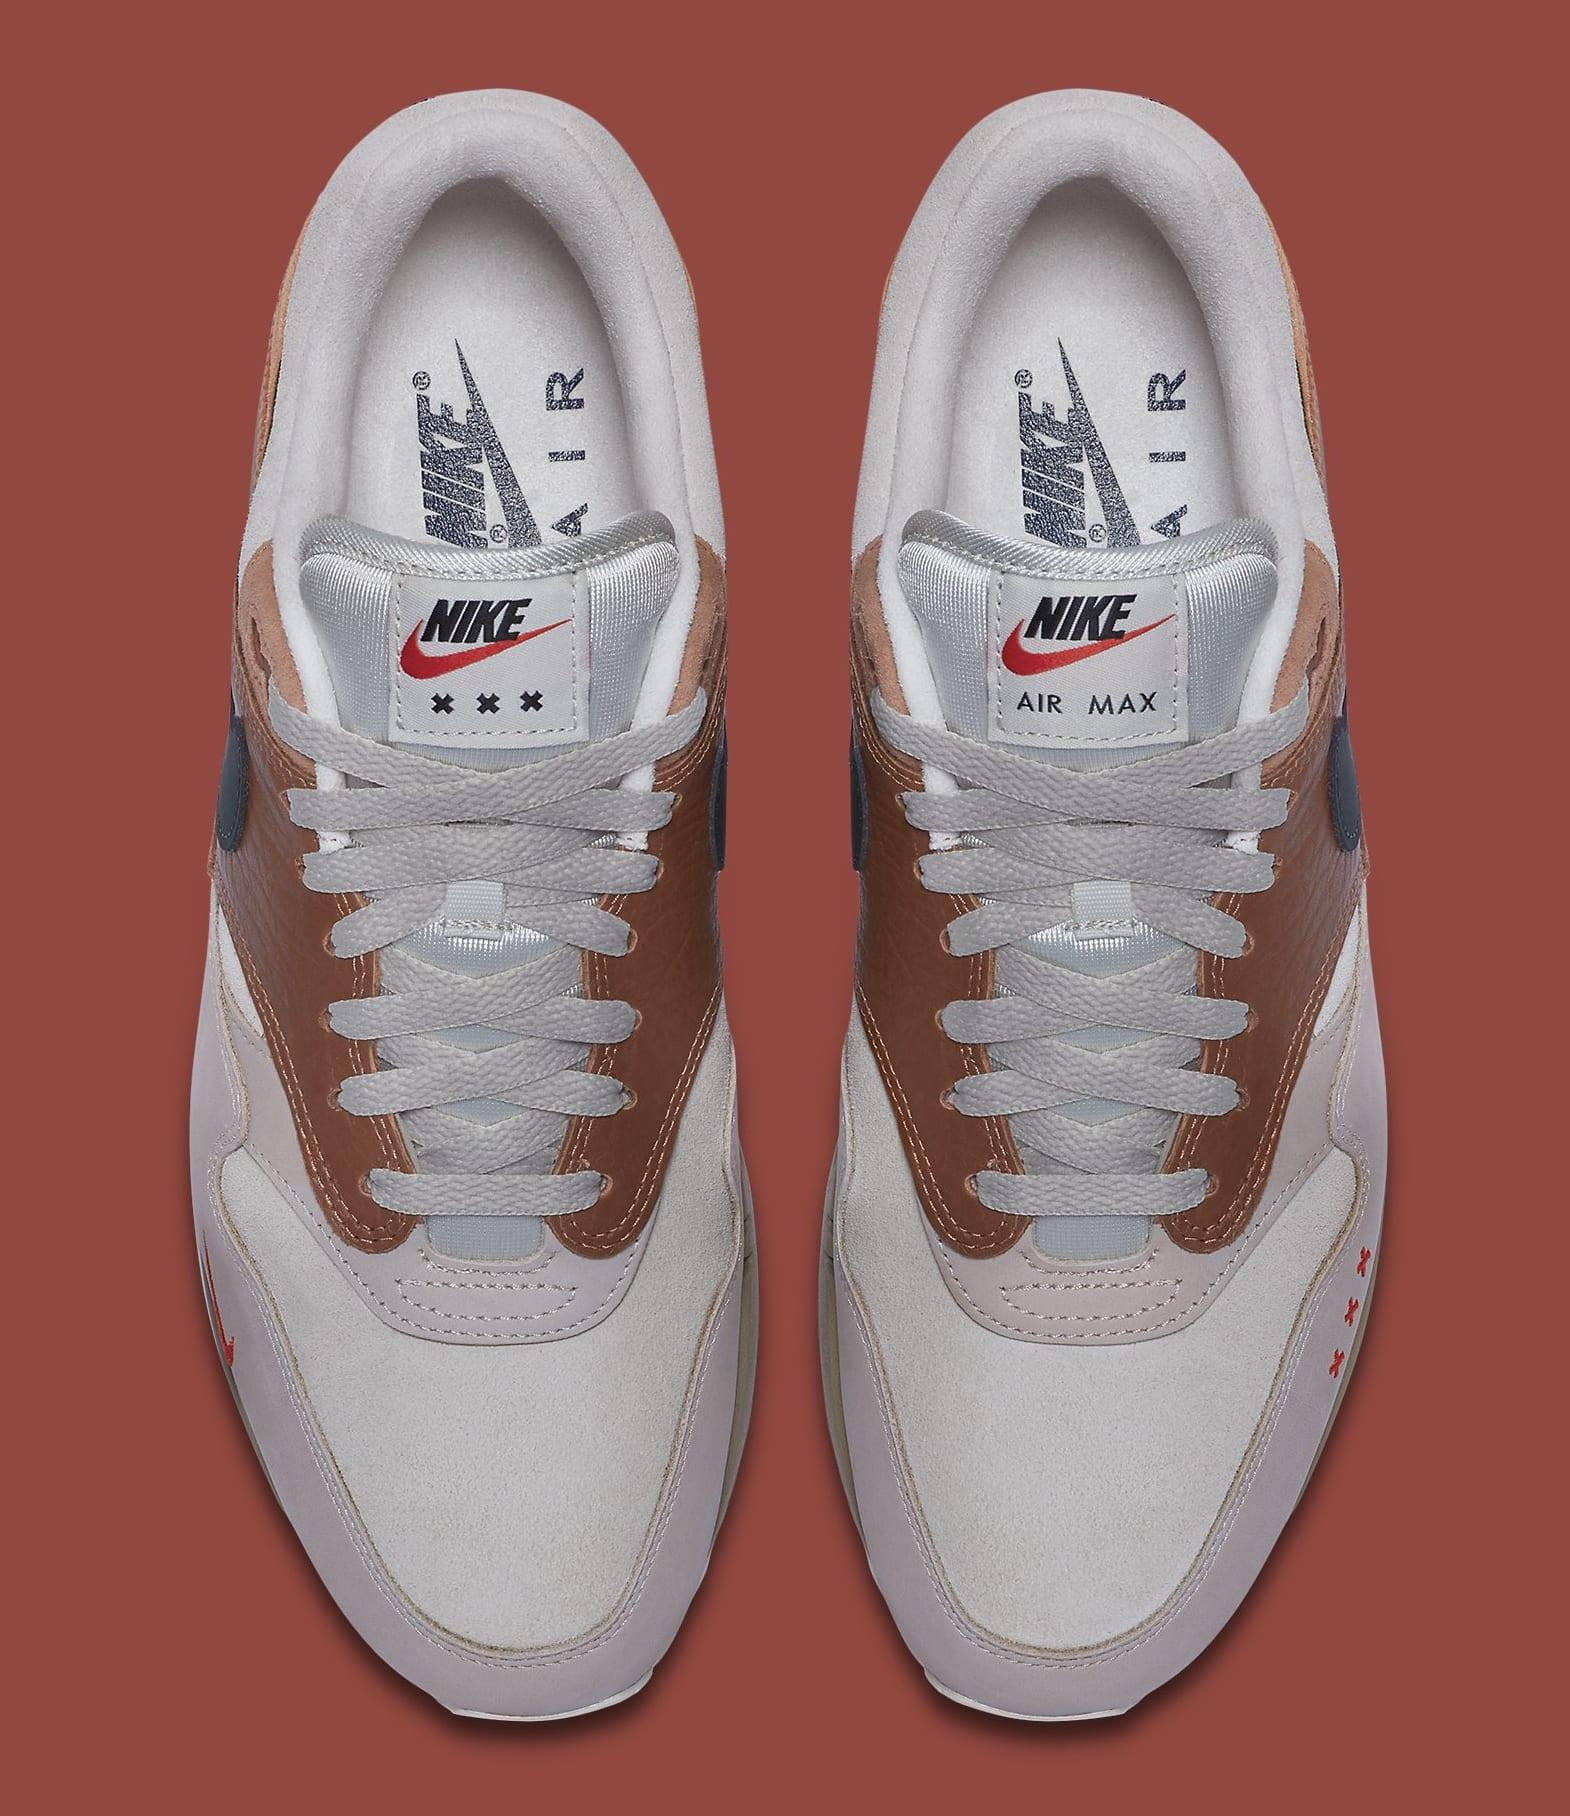 Nike Air Max 1 'City Pack' Amsterdam CV1638-200 Top